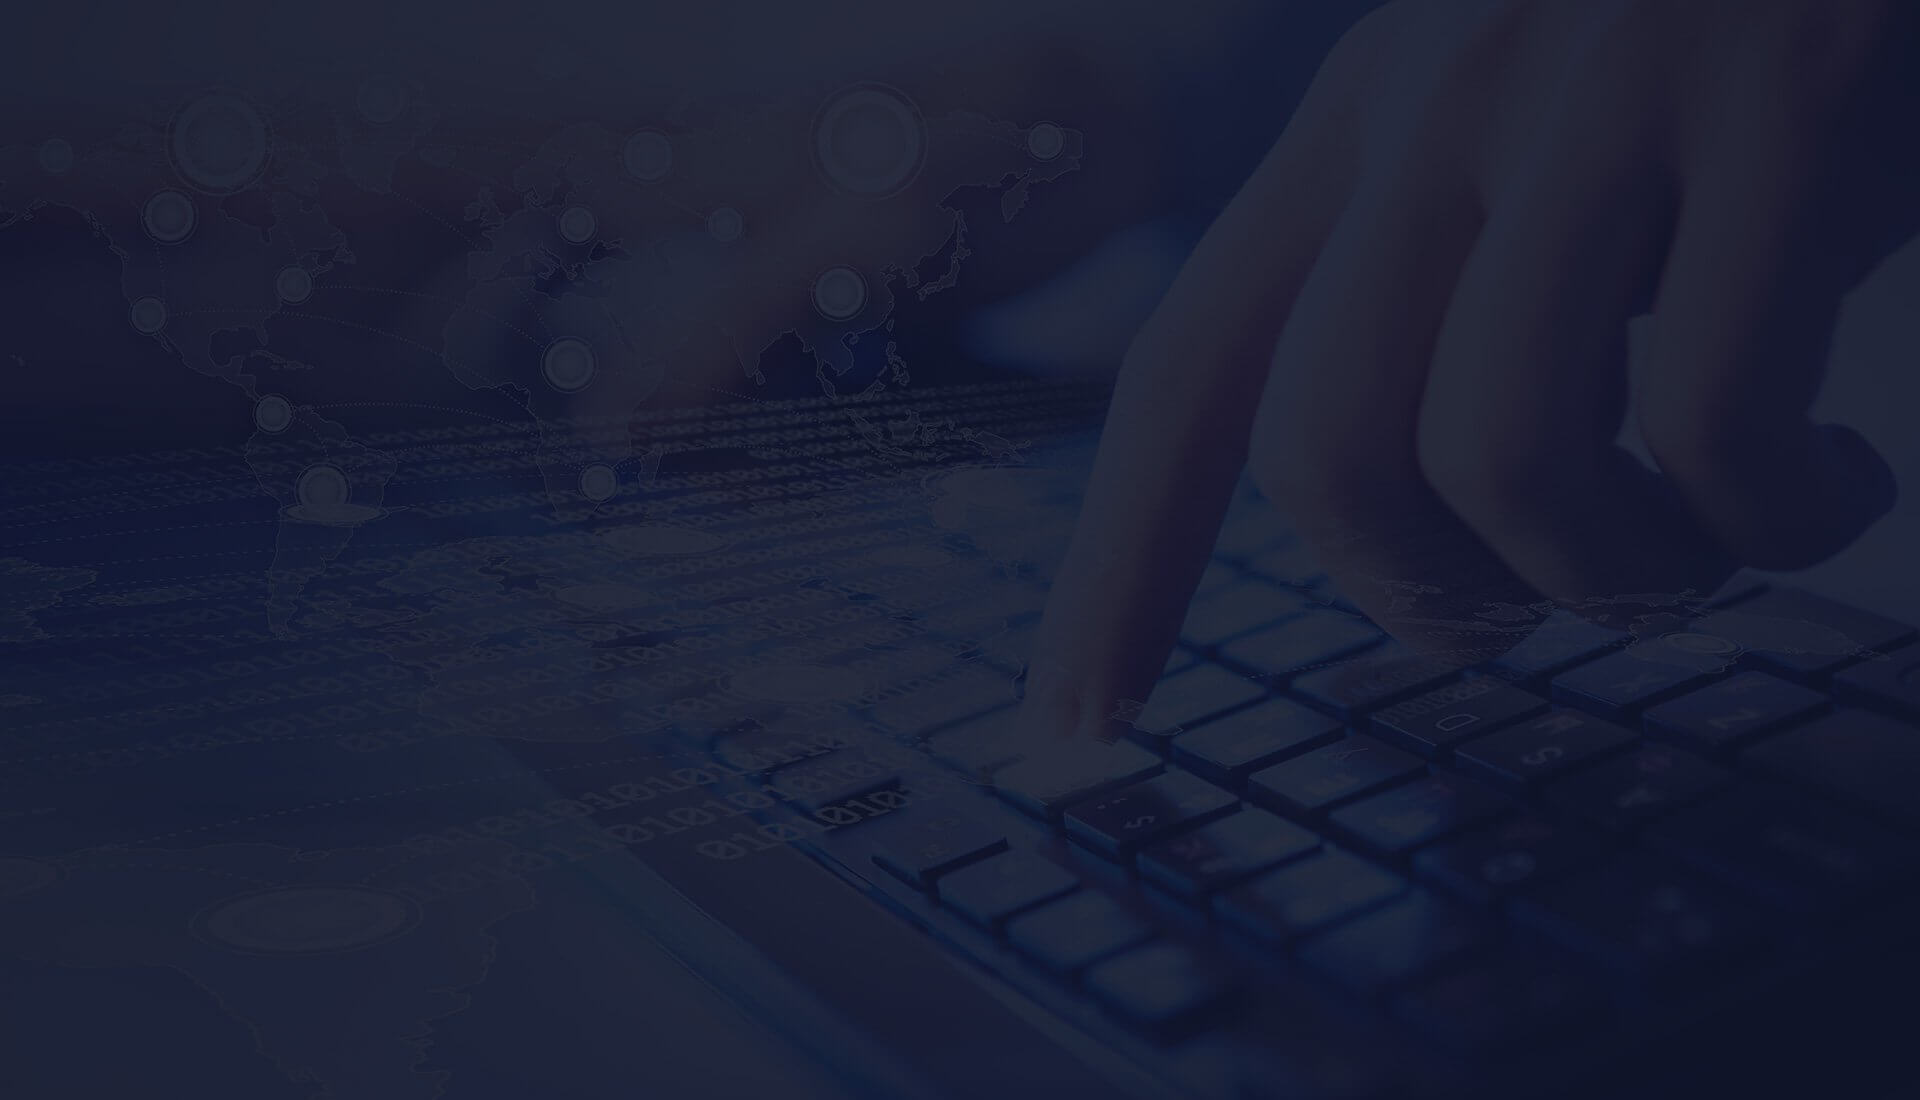 Azure Managed Services, Azure Managed Services